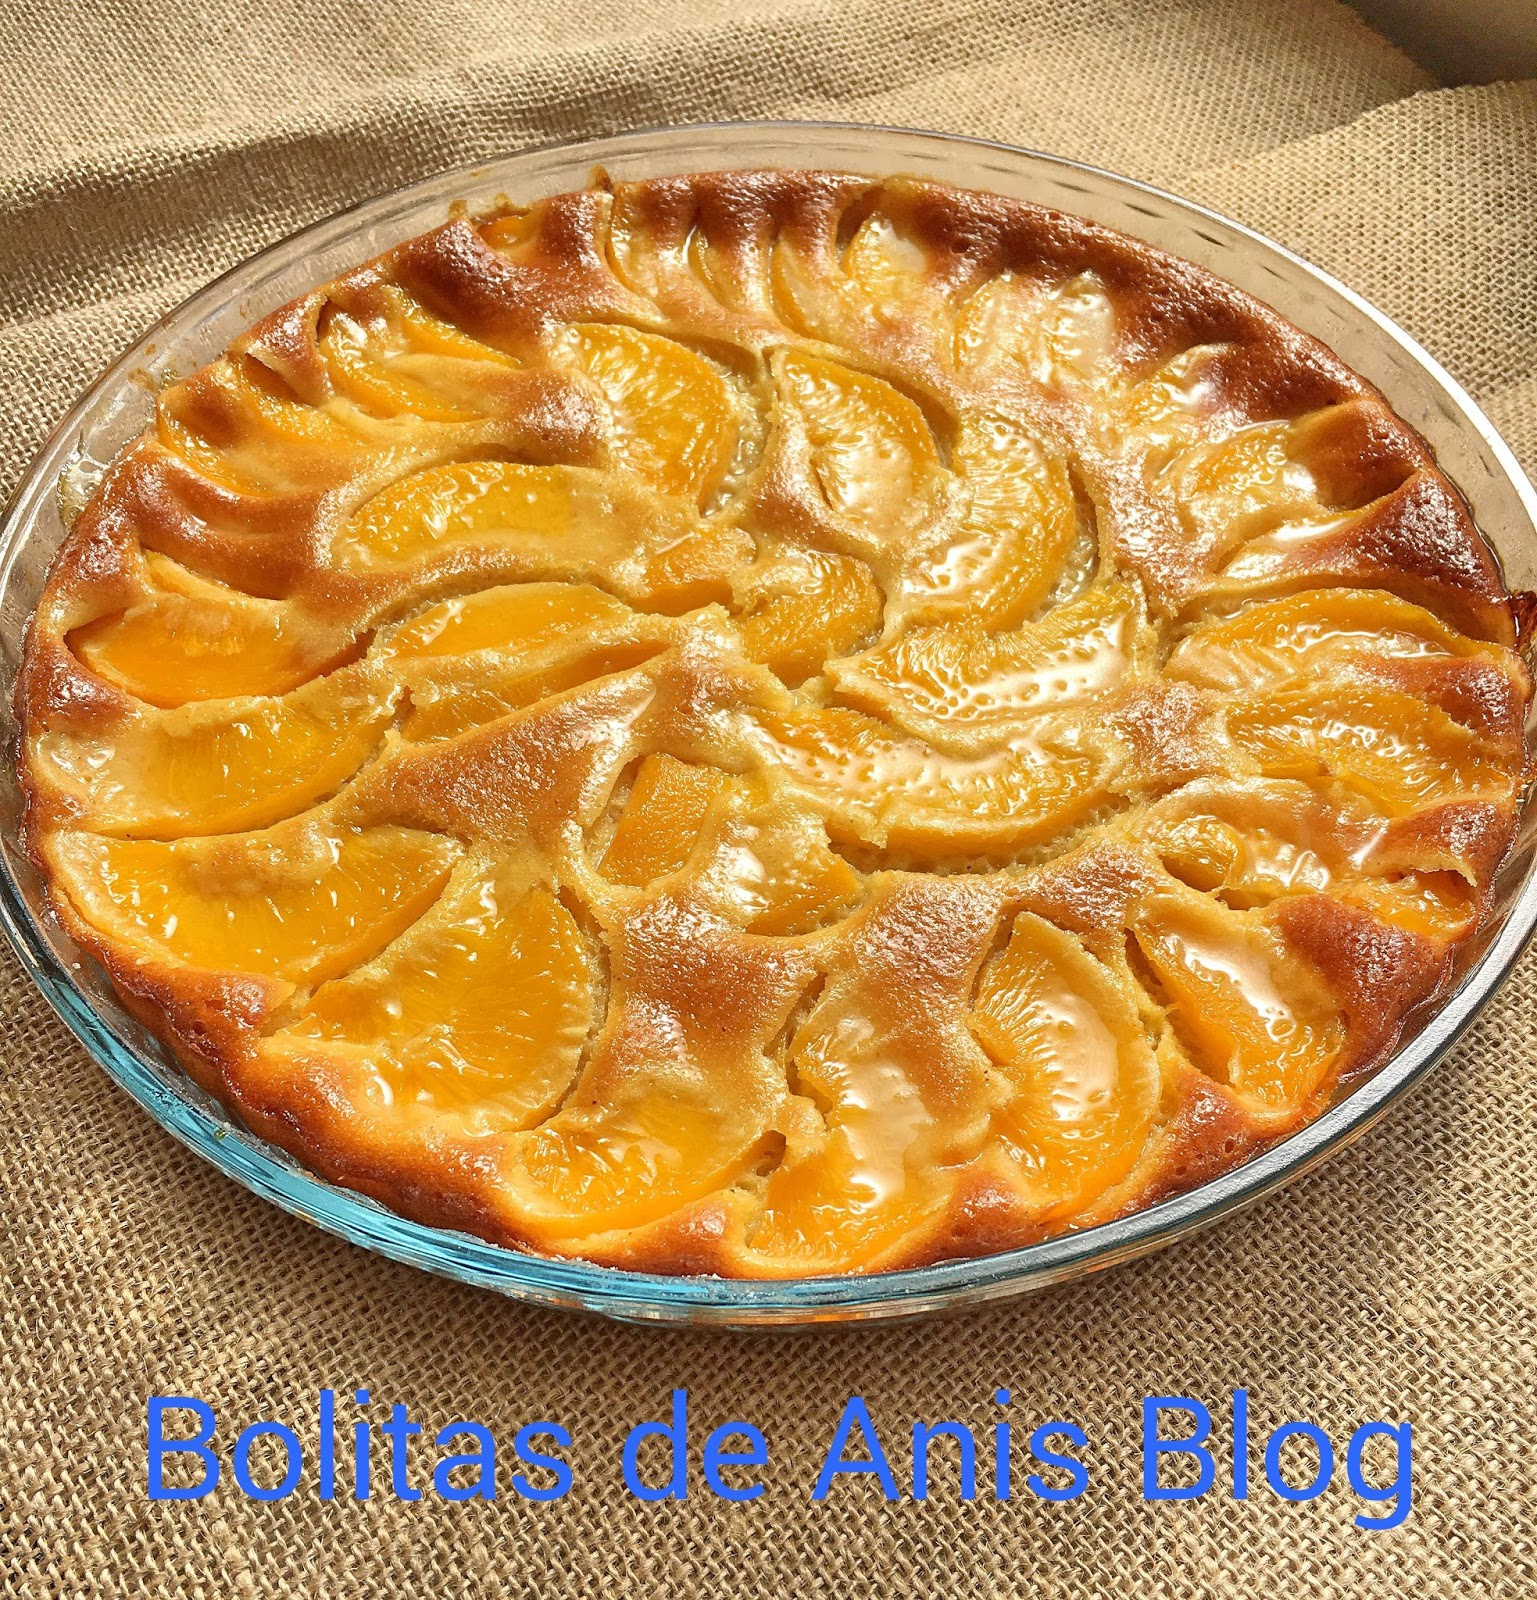 Bolitas de an s tarta de melocot n en almibar - Como hacer melocoton en almibar ...